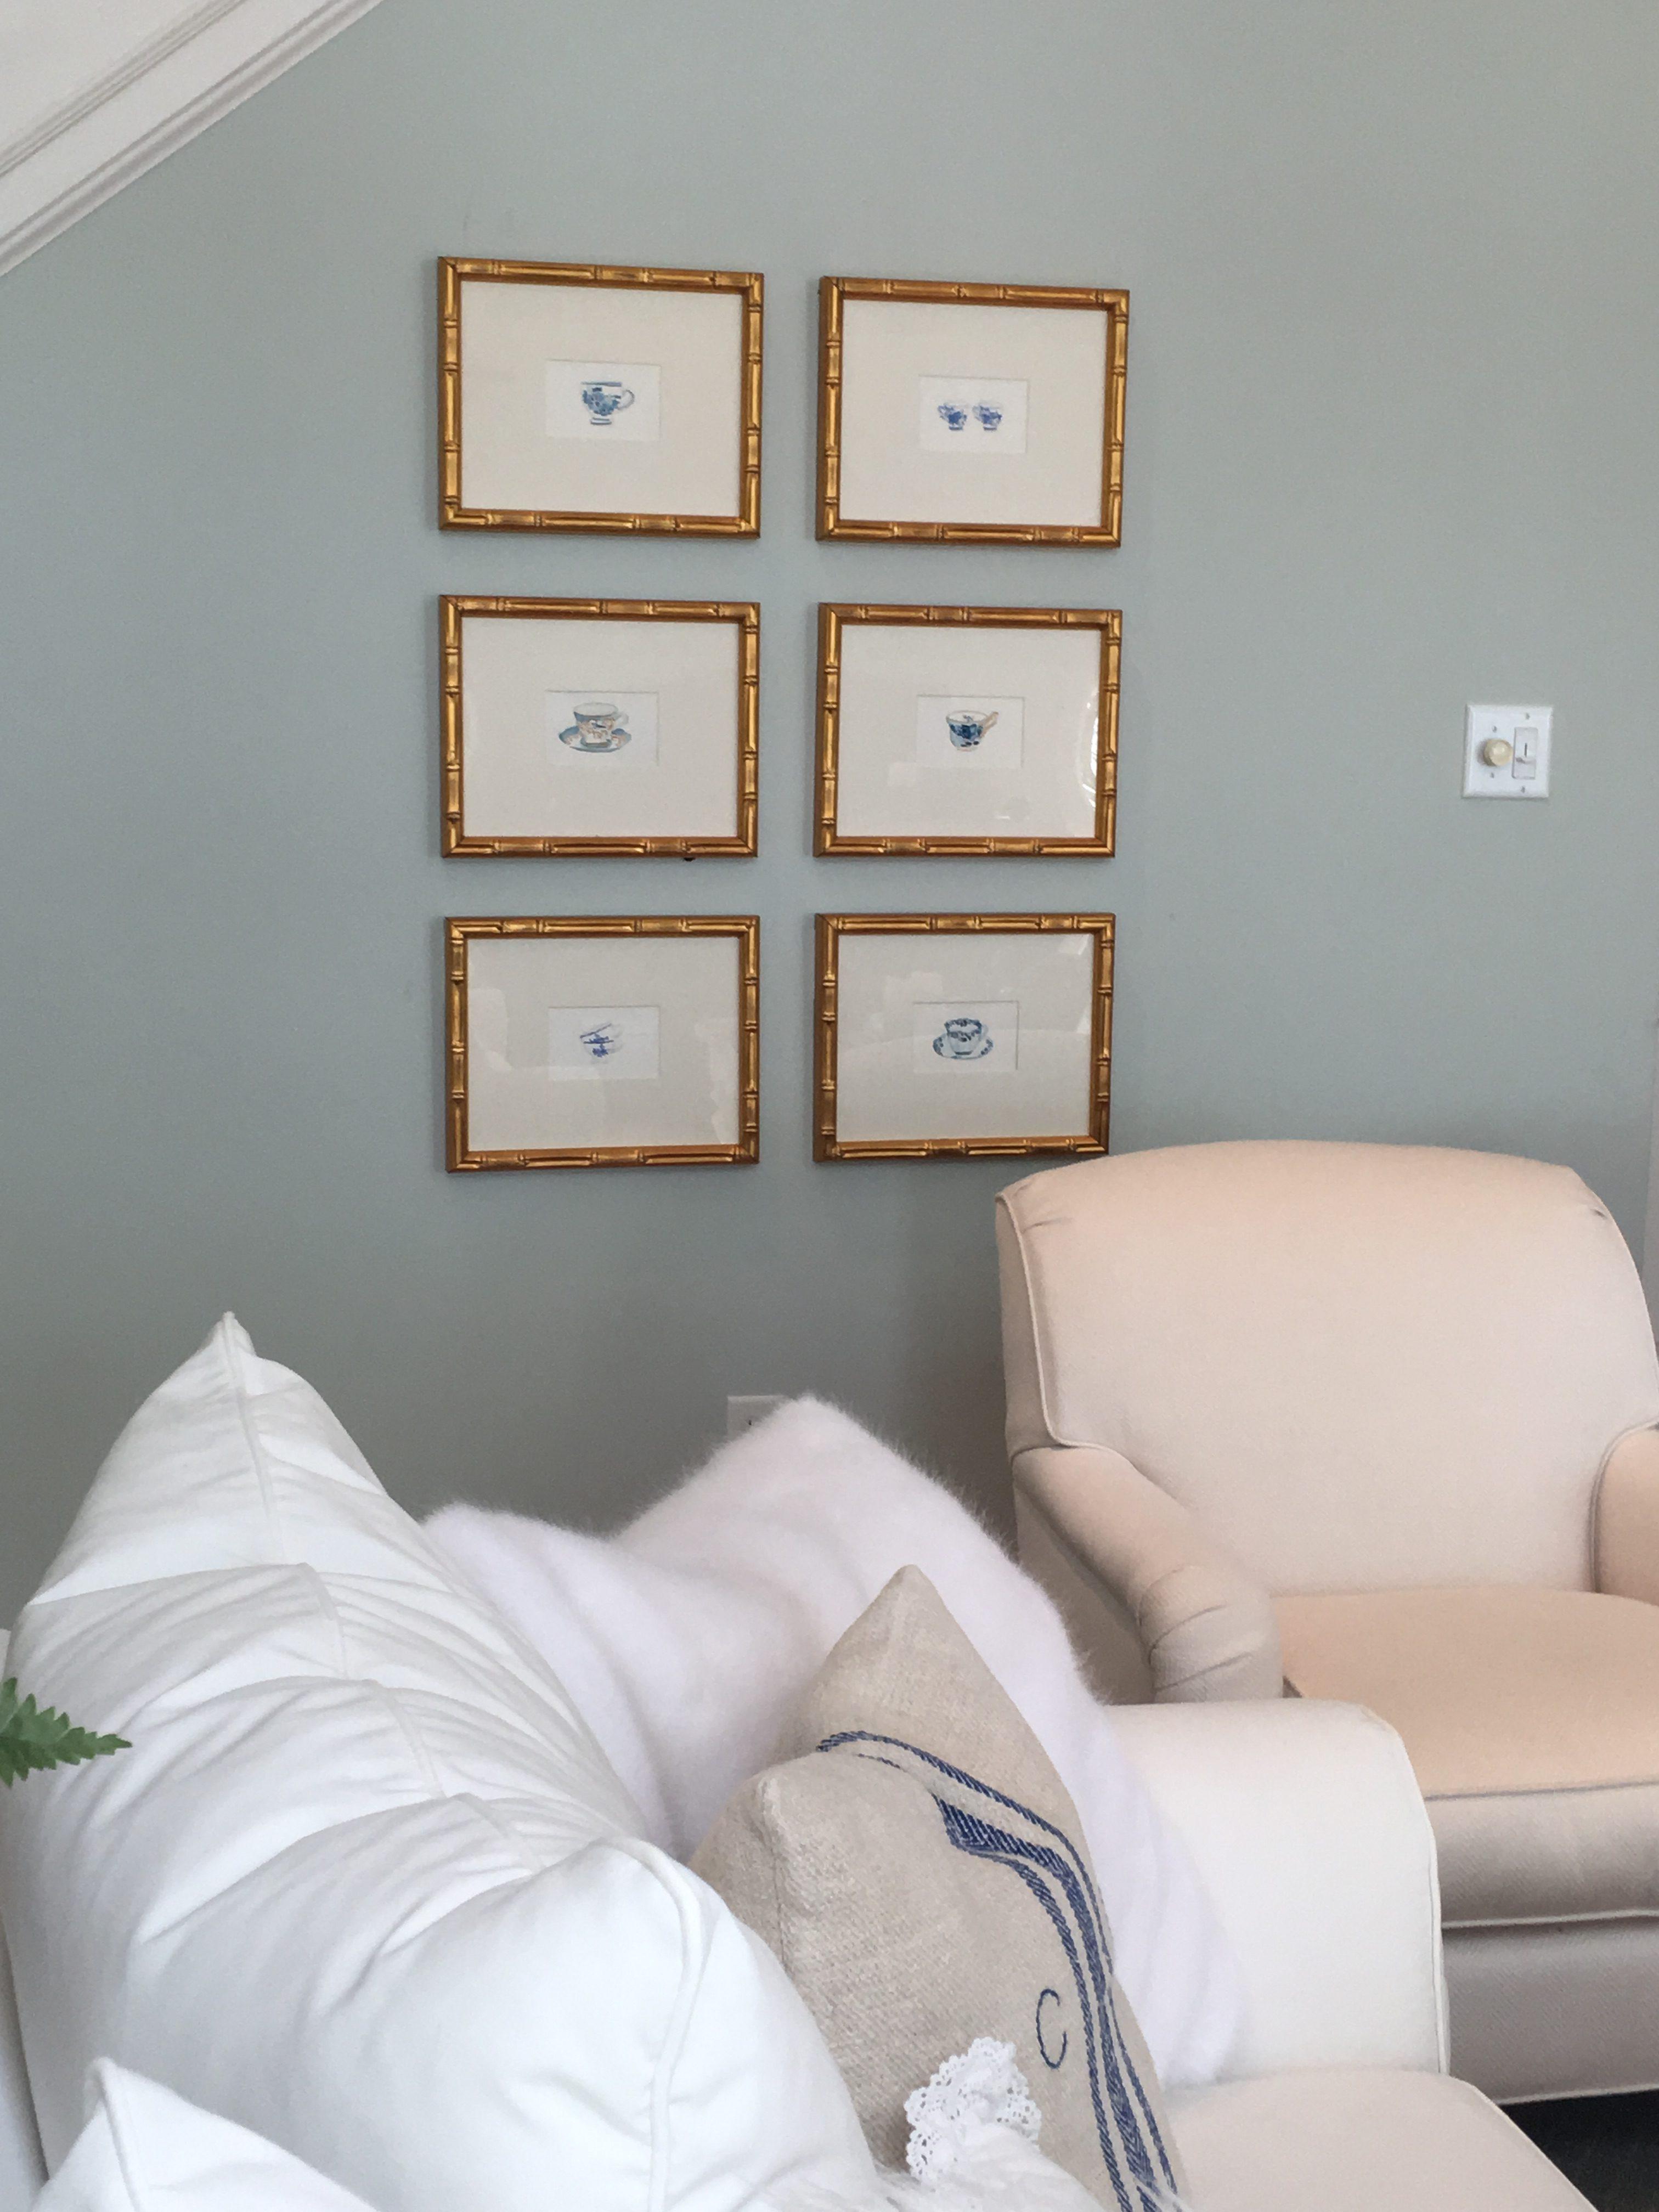 ways rearrange bedroom decorate tips decorating time 17 best ideas about rearrange bedroom on pinterest